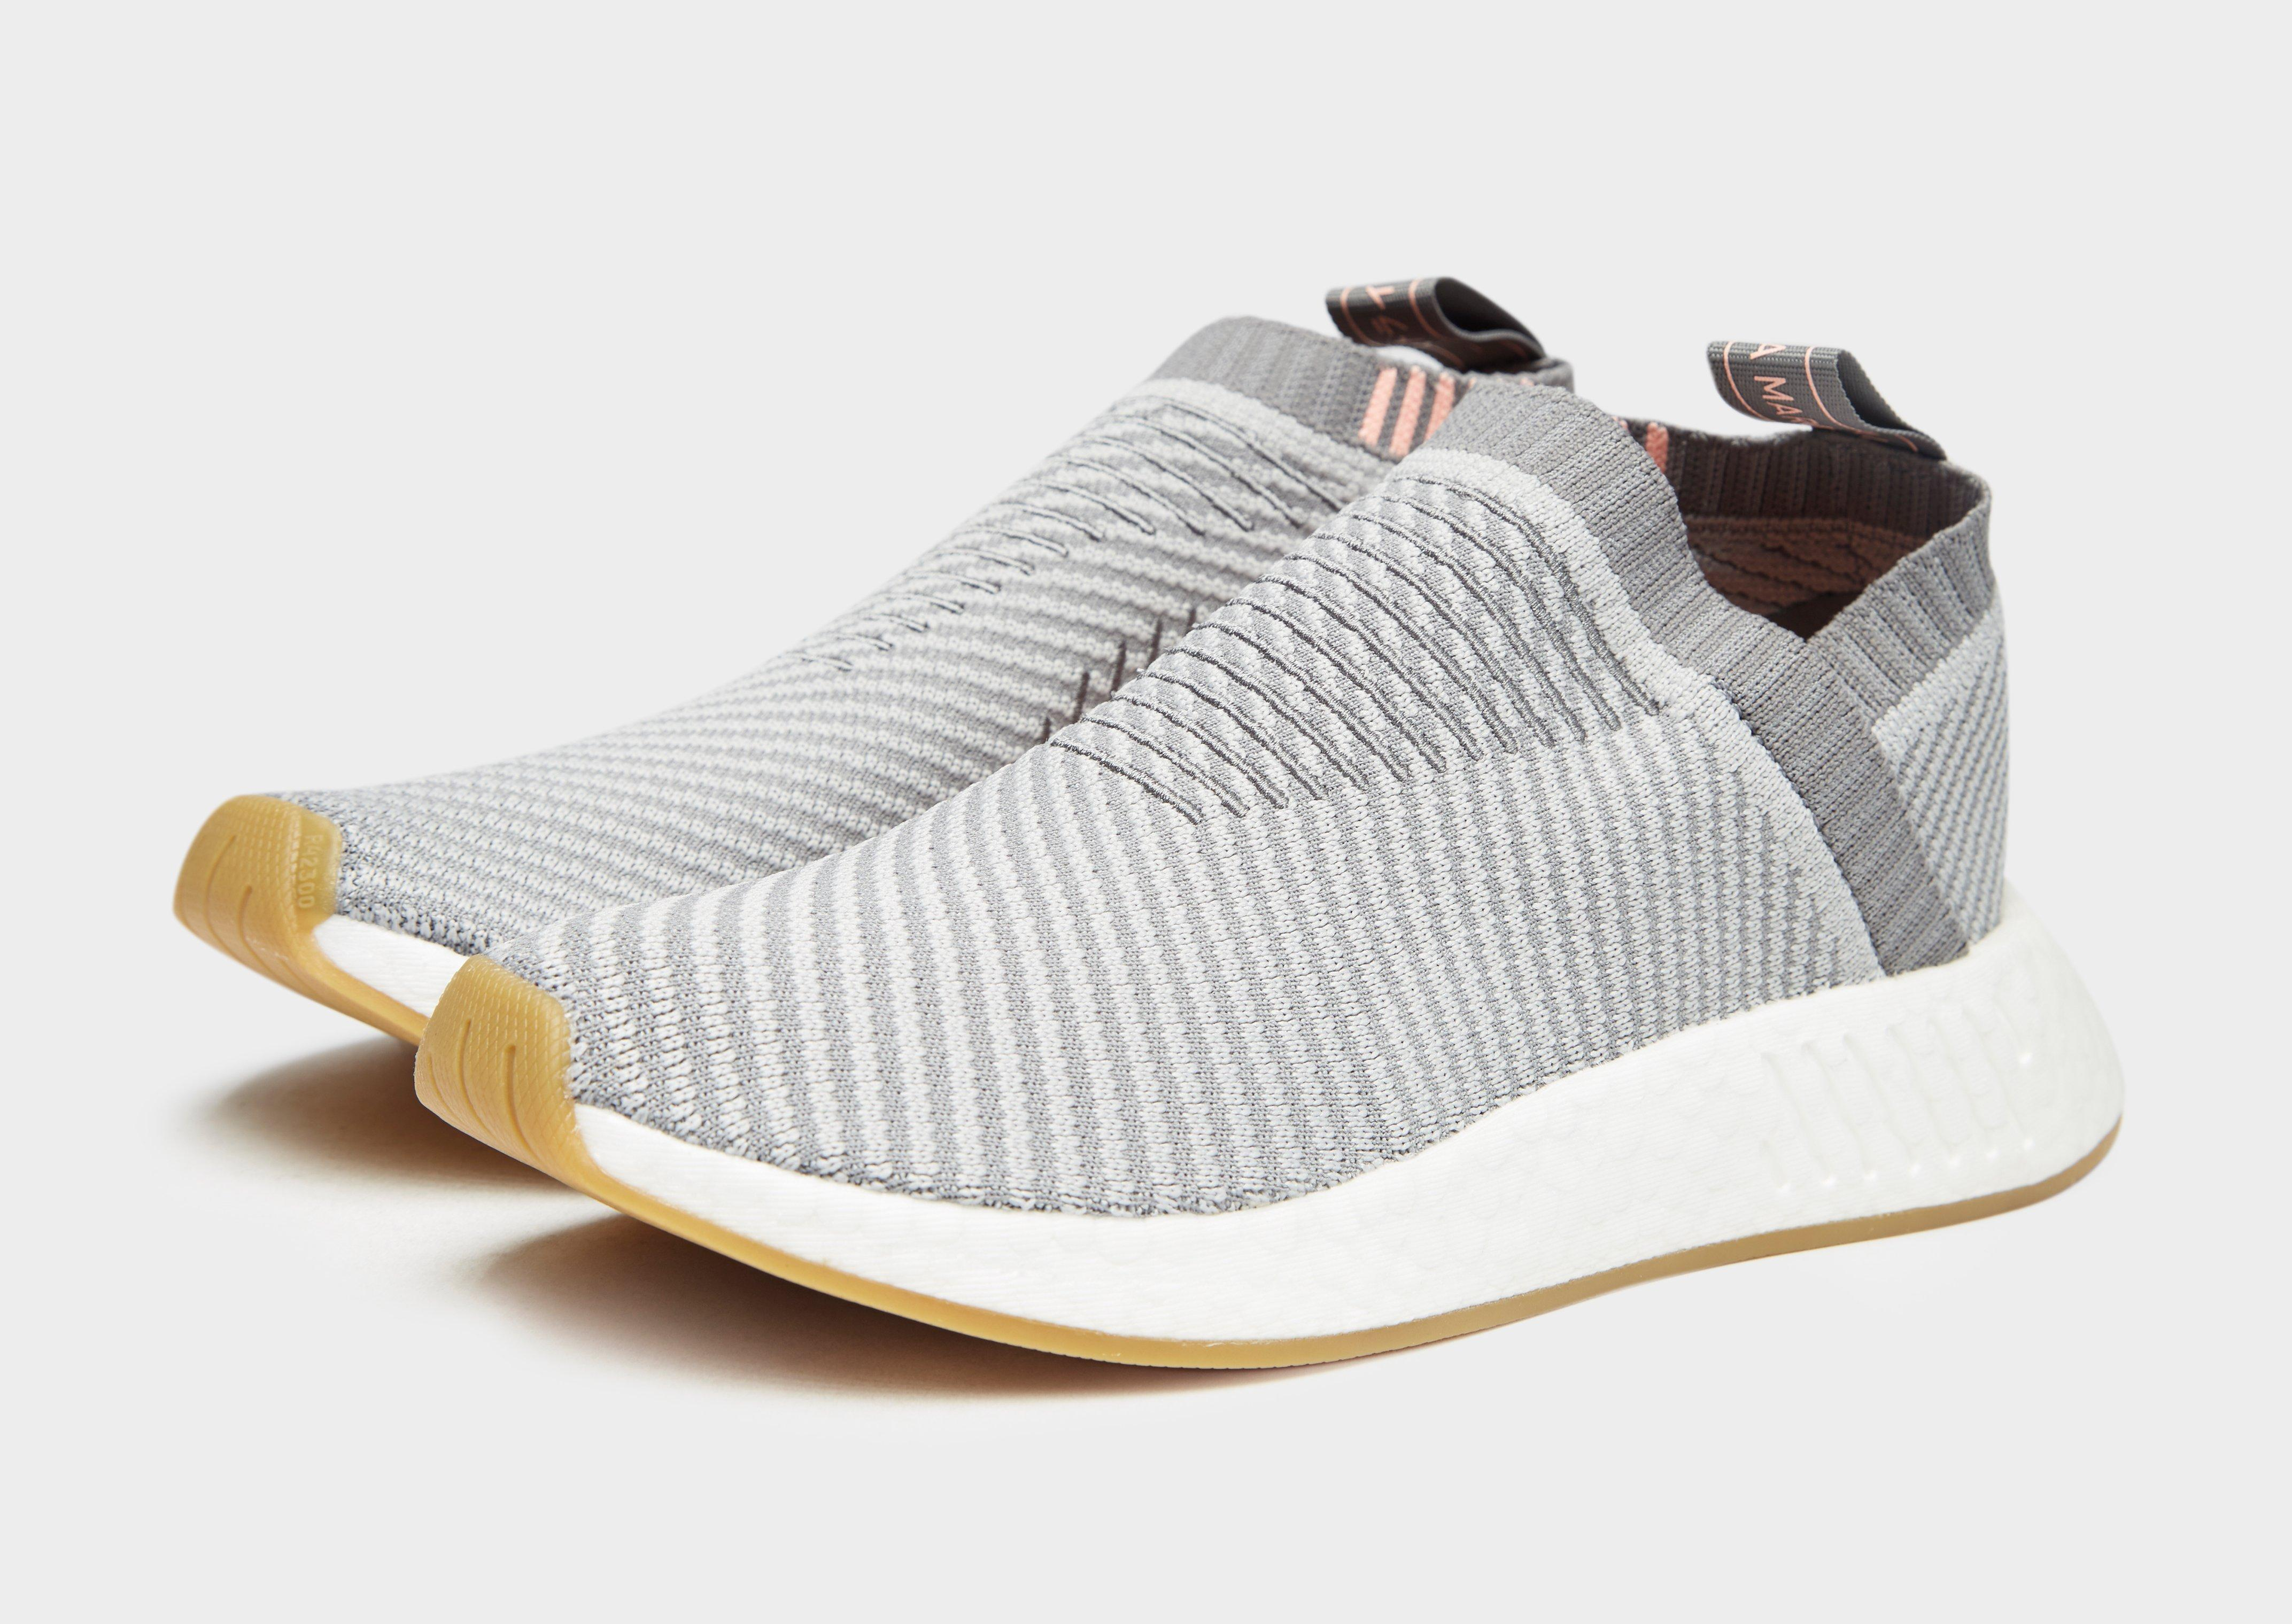 b058fc72073 Lyst - Adidas Originals Nmd cs2 in Gray